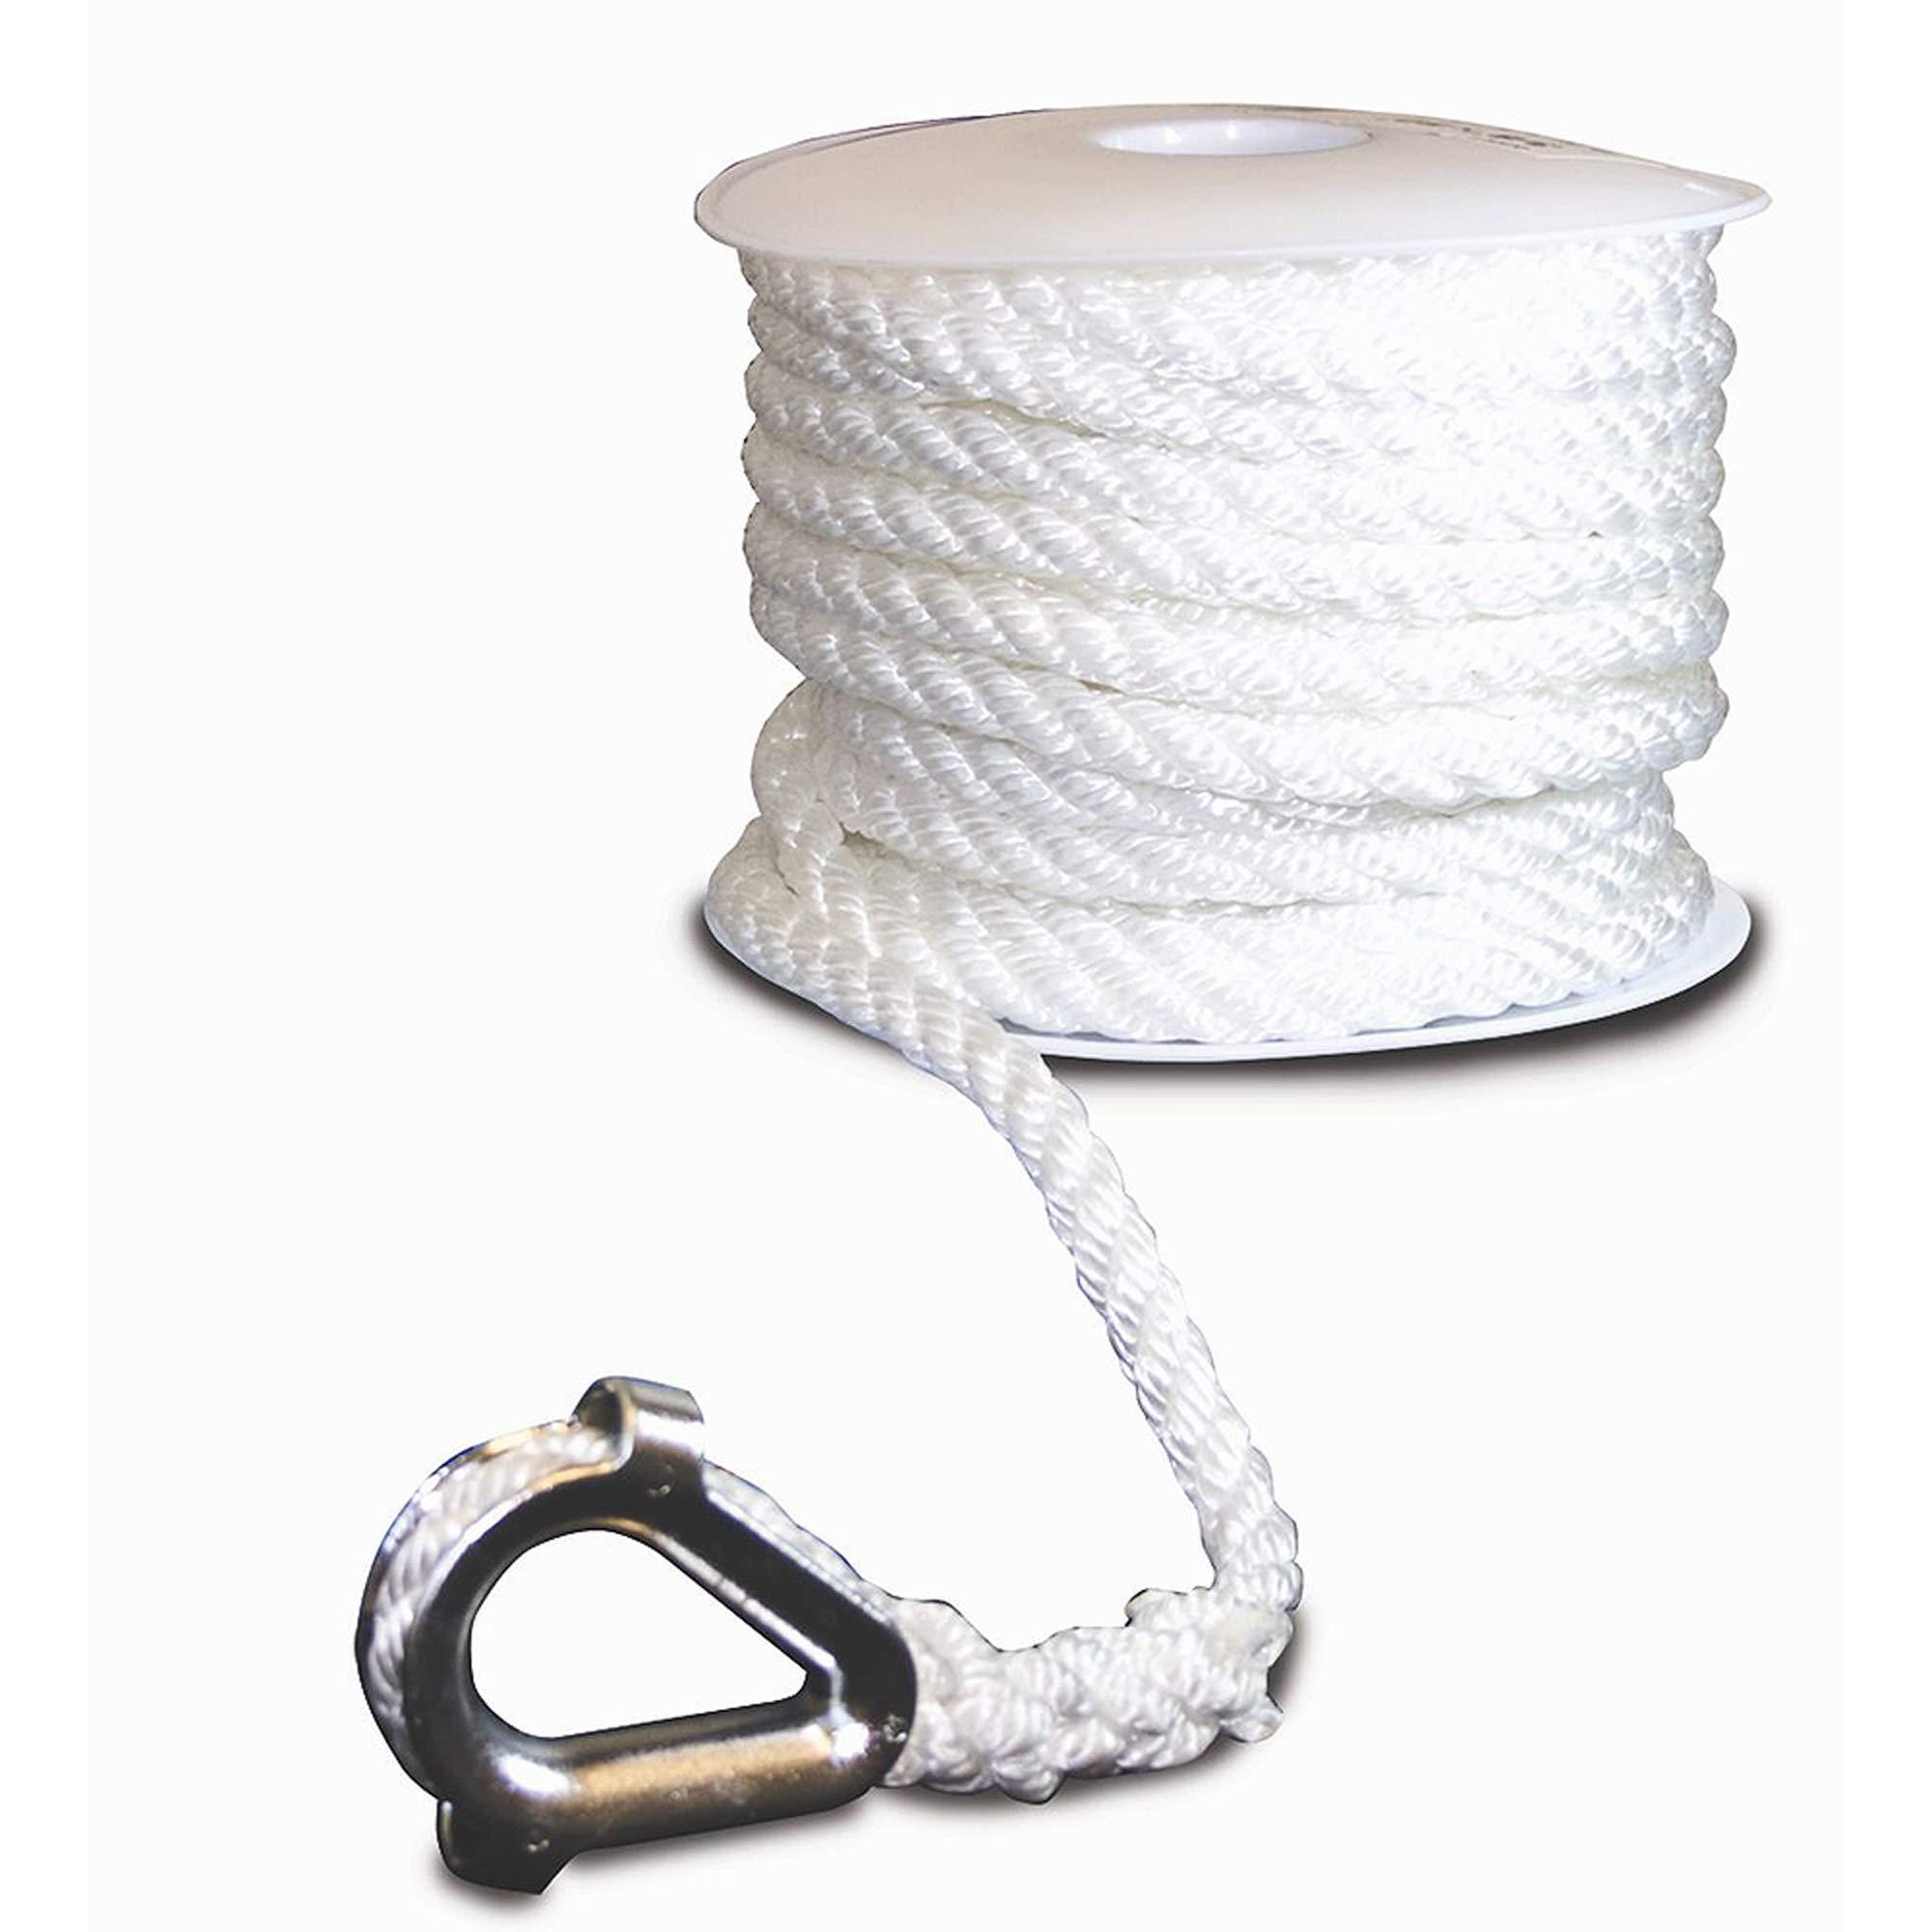 Aromzen Three-Strand Twisted Nylon Anchor Line with Thimble End, 1/2'' x 150', White by Aromzen